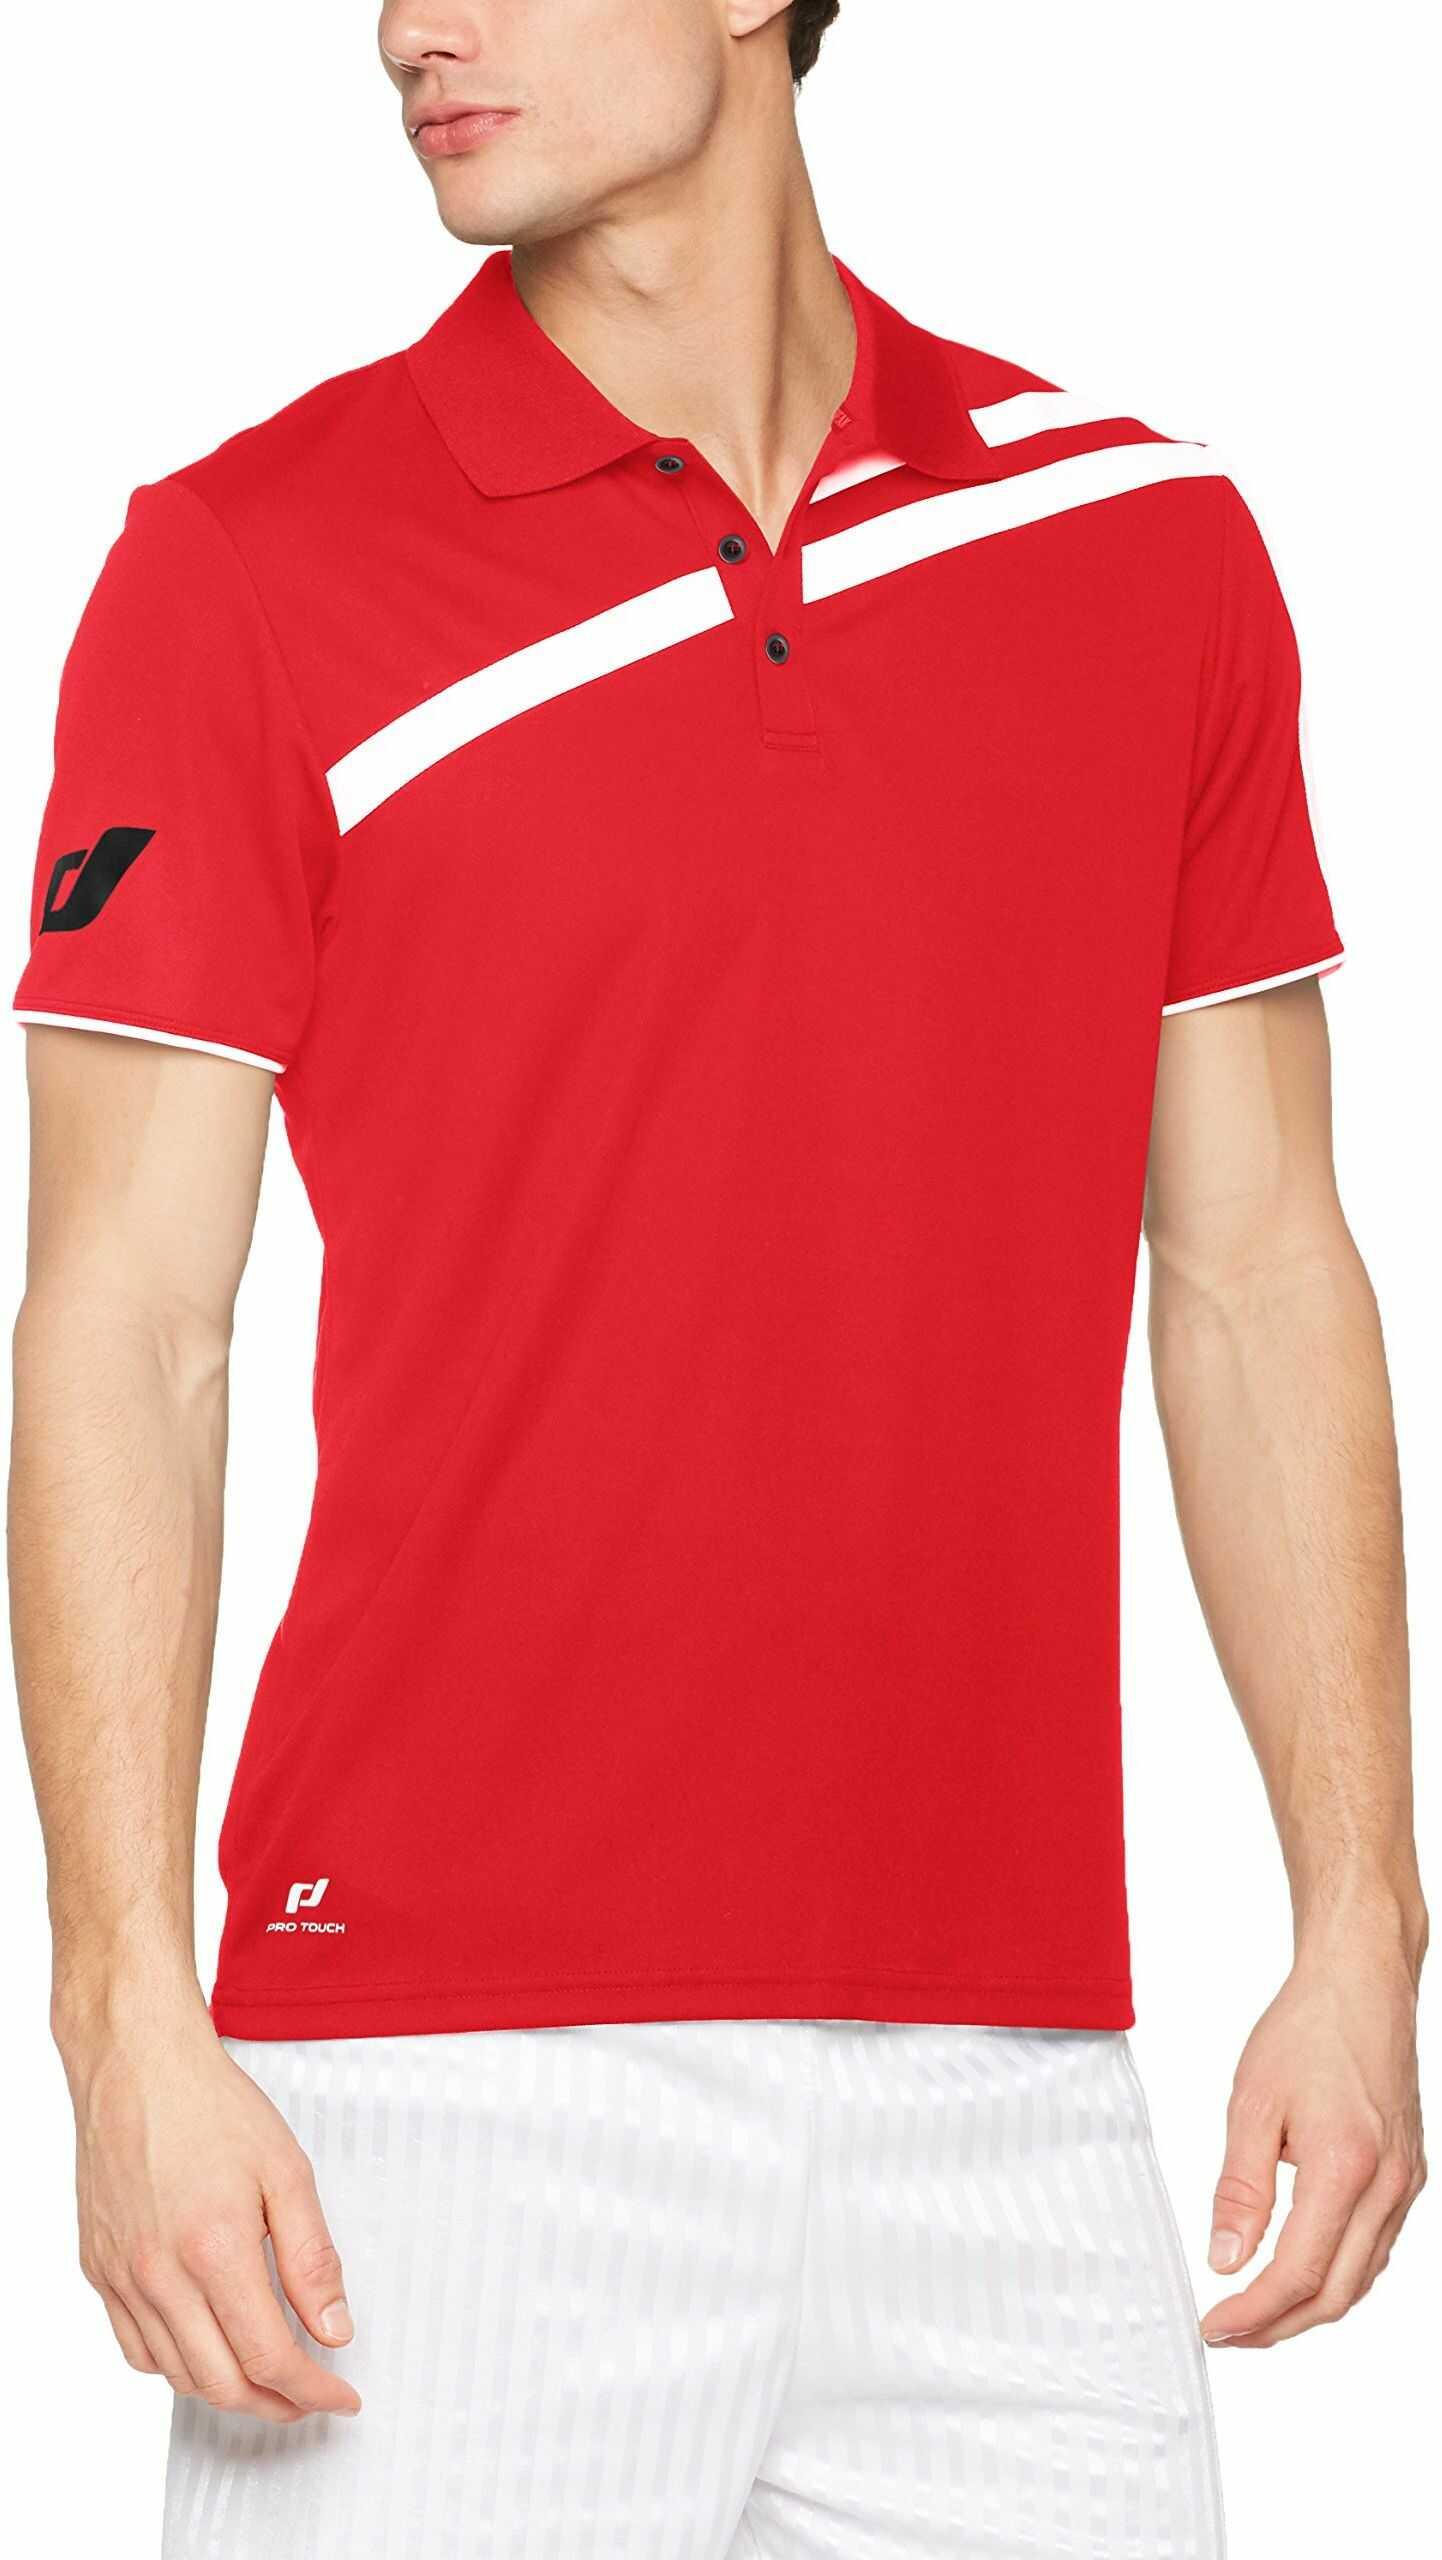 Pro Touch Męska koszulka polo Kurtis, czerwona, M